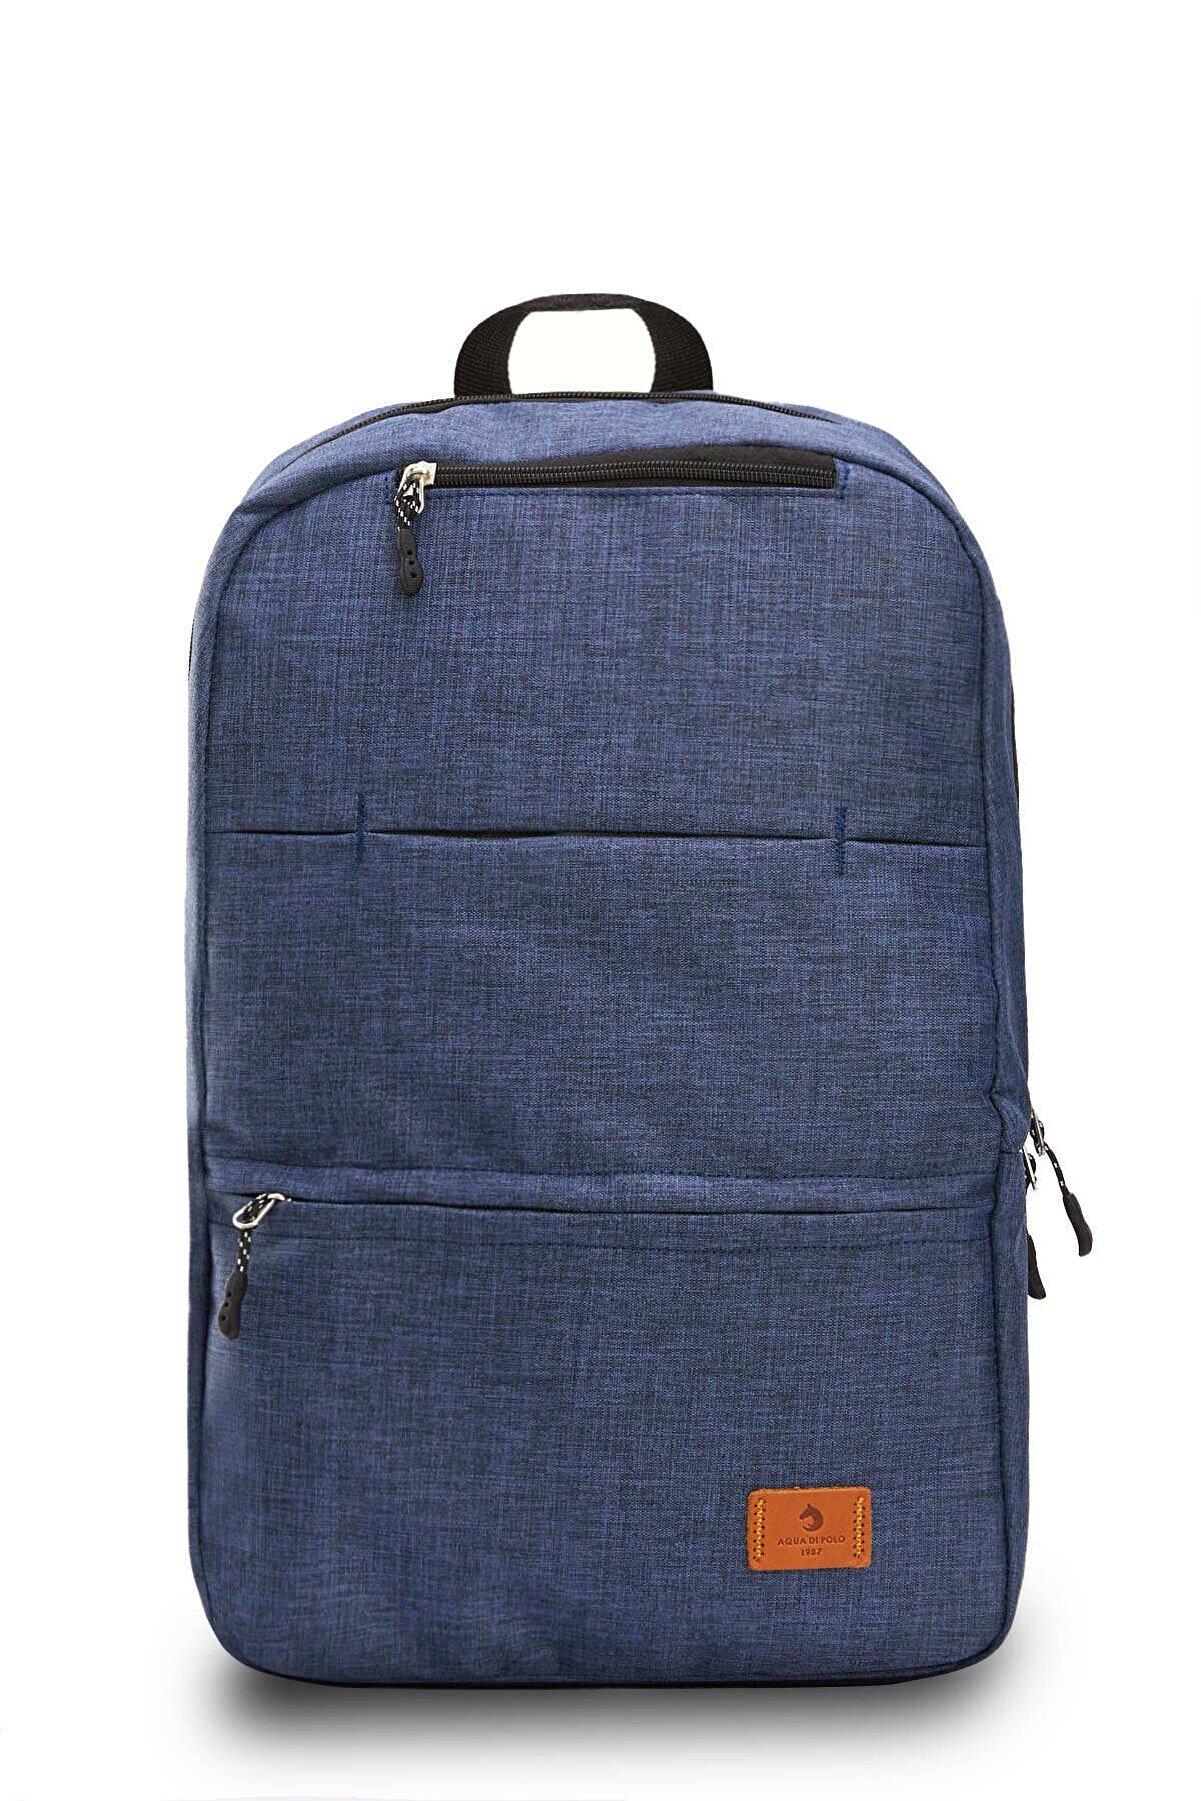 Aqua Di Polo Sırt Çantası (Laptop,notebook,okul, Spor ) Unisex Apba010905